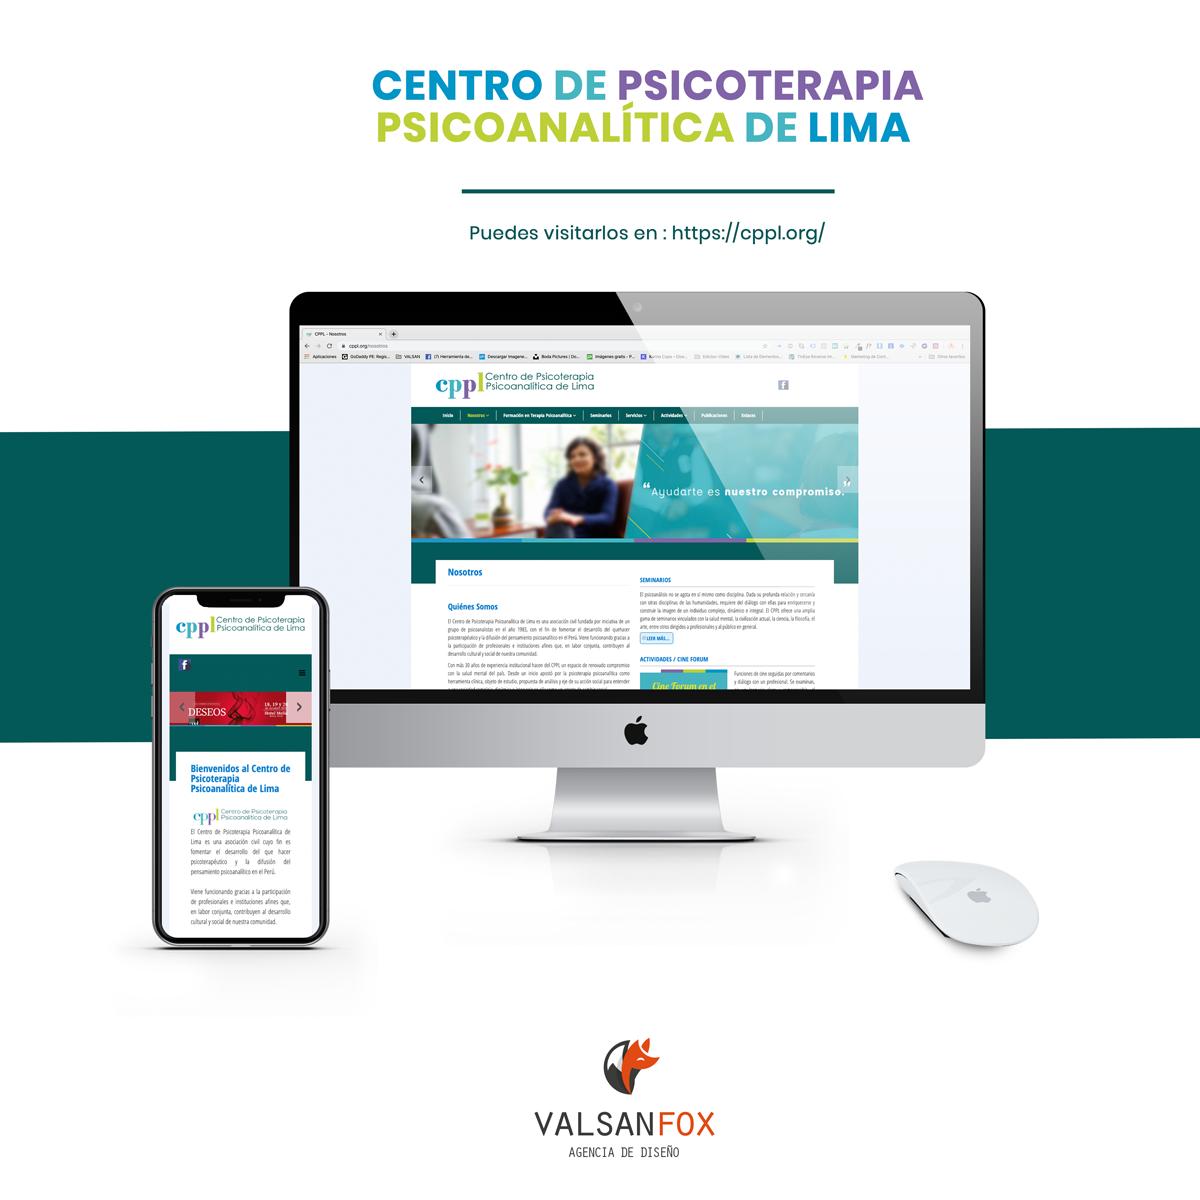 centro de psicoterapia psicoanalítica de lima